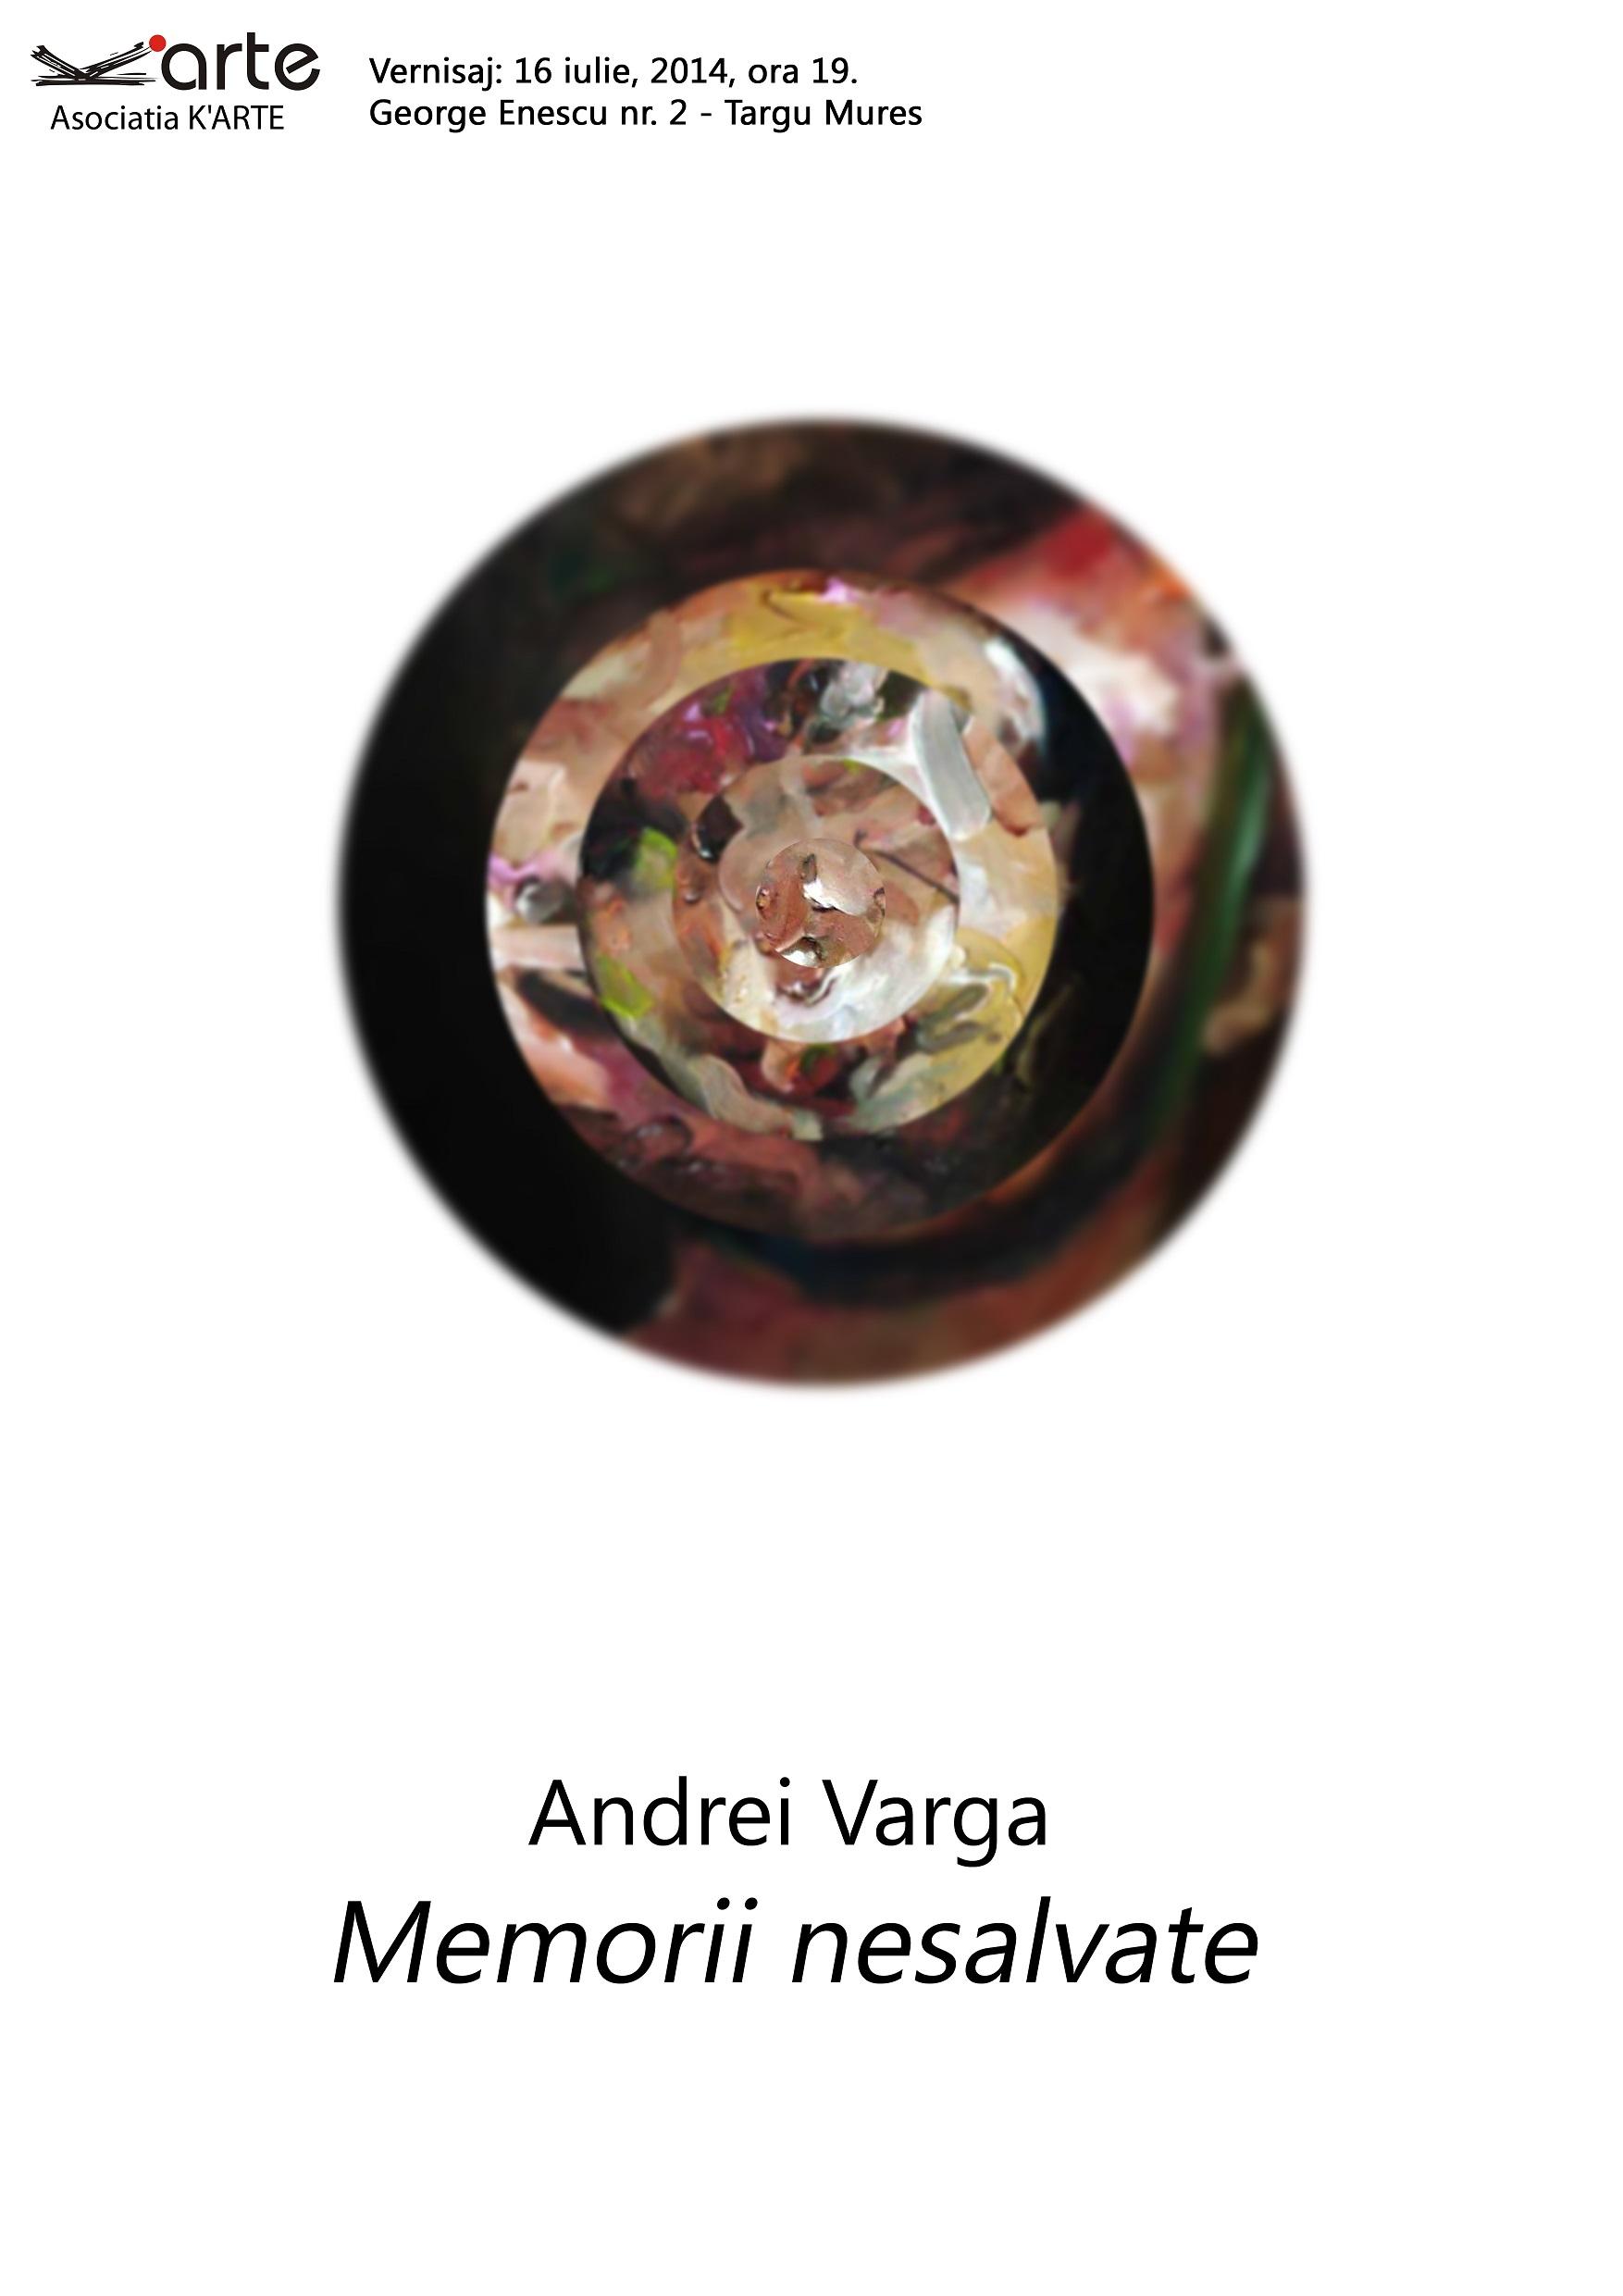 Andrei Varga